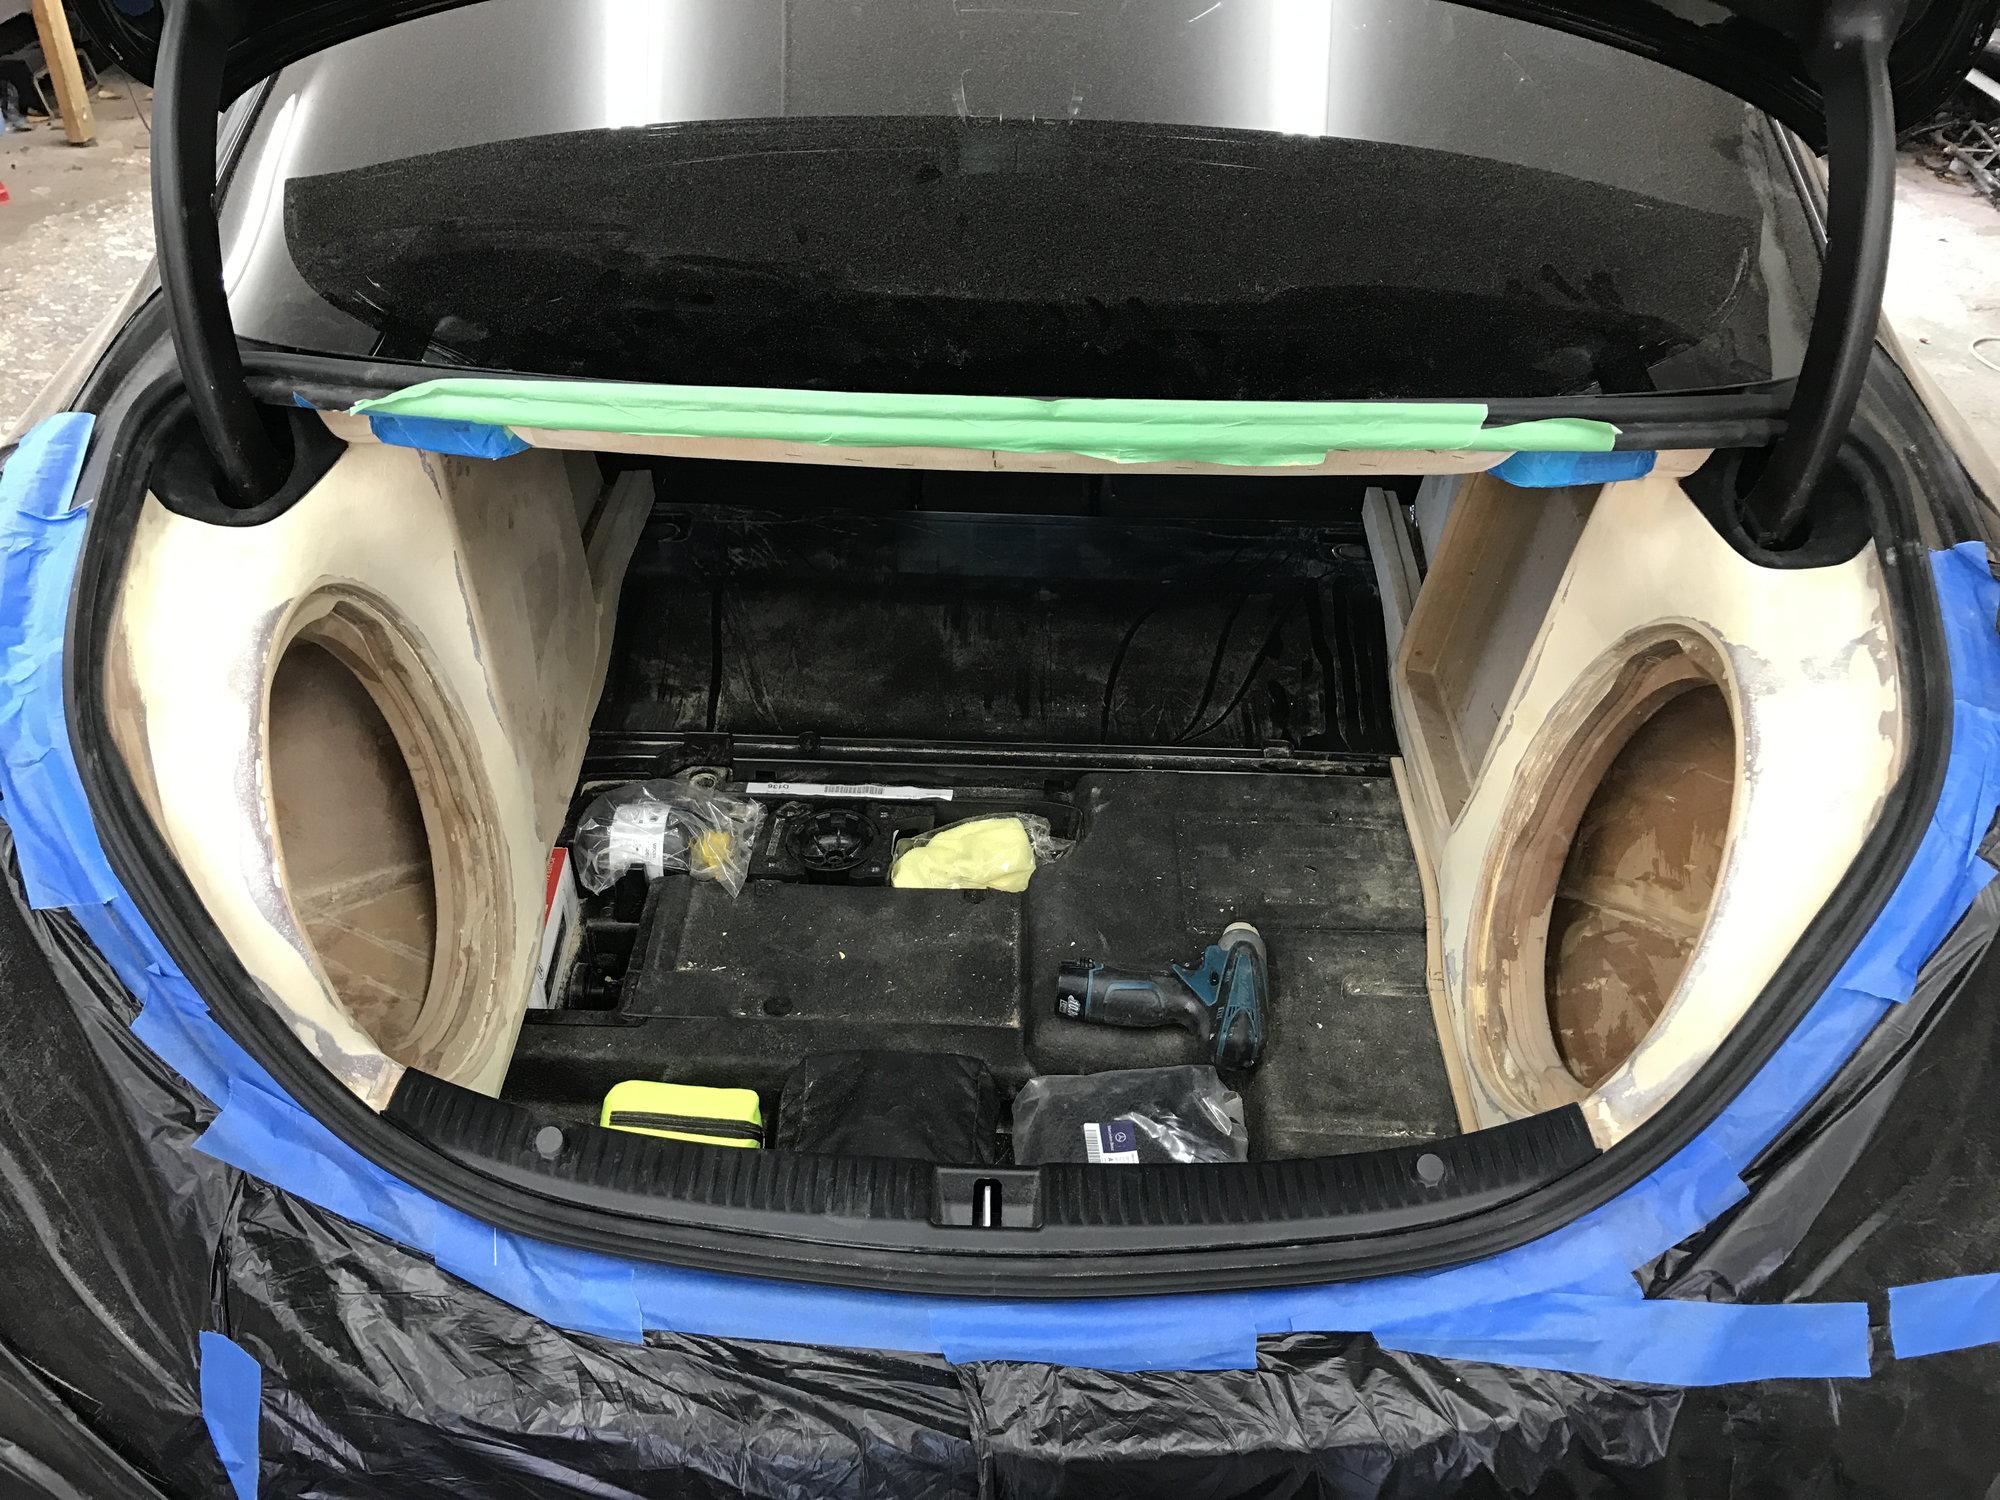 Custom Subwoofer Trunk Install - MBWorld org Forums